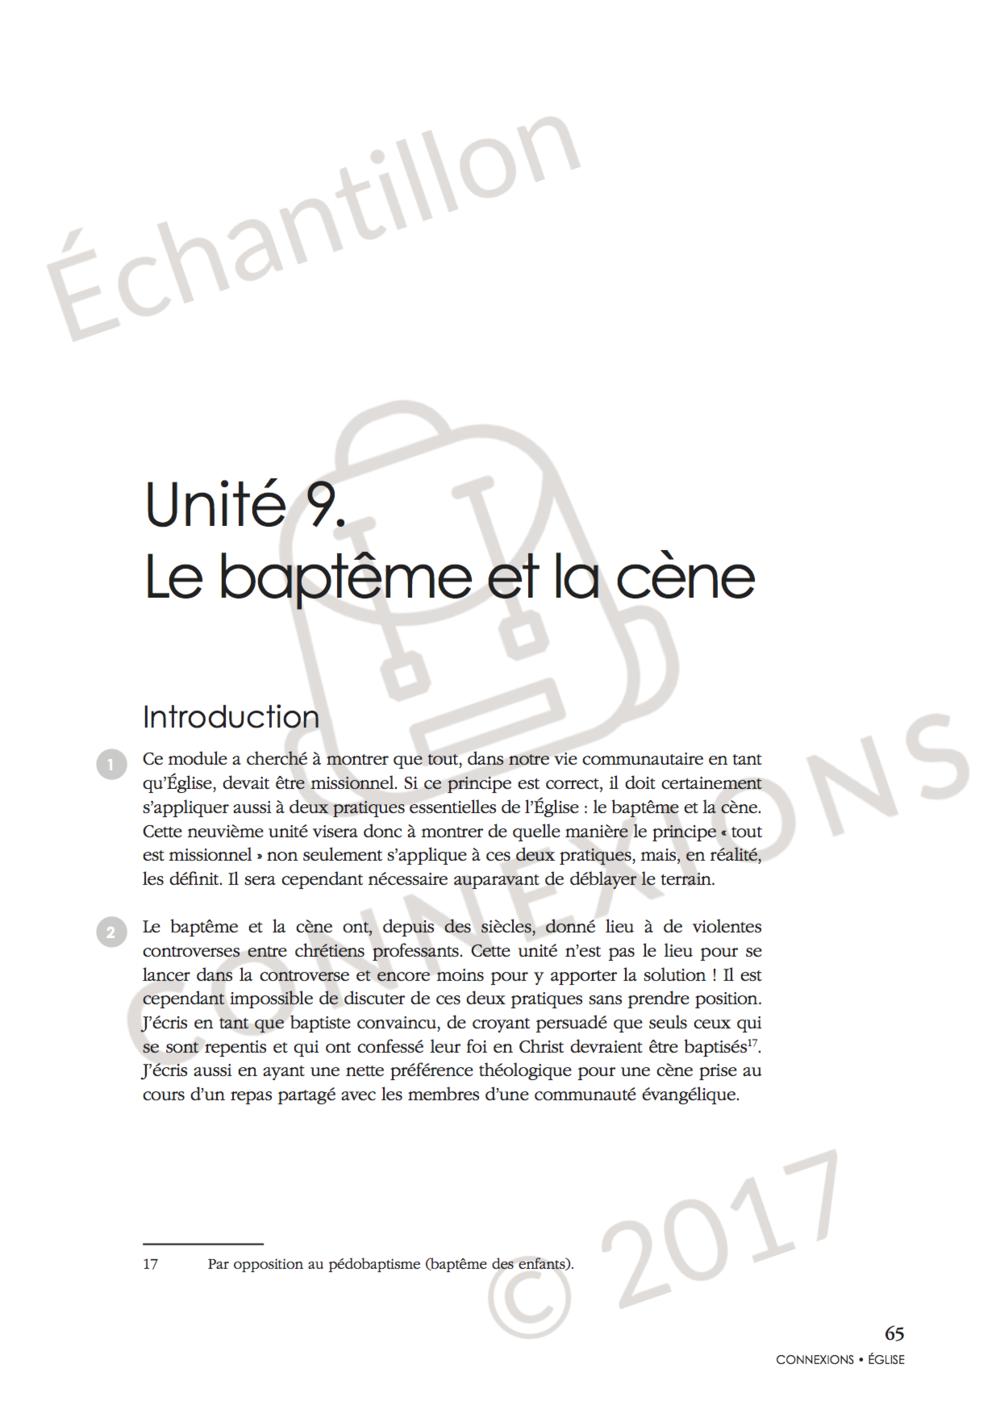 Garder le cap missionnel_sample_published.2.png